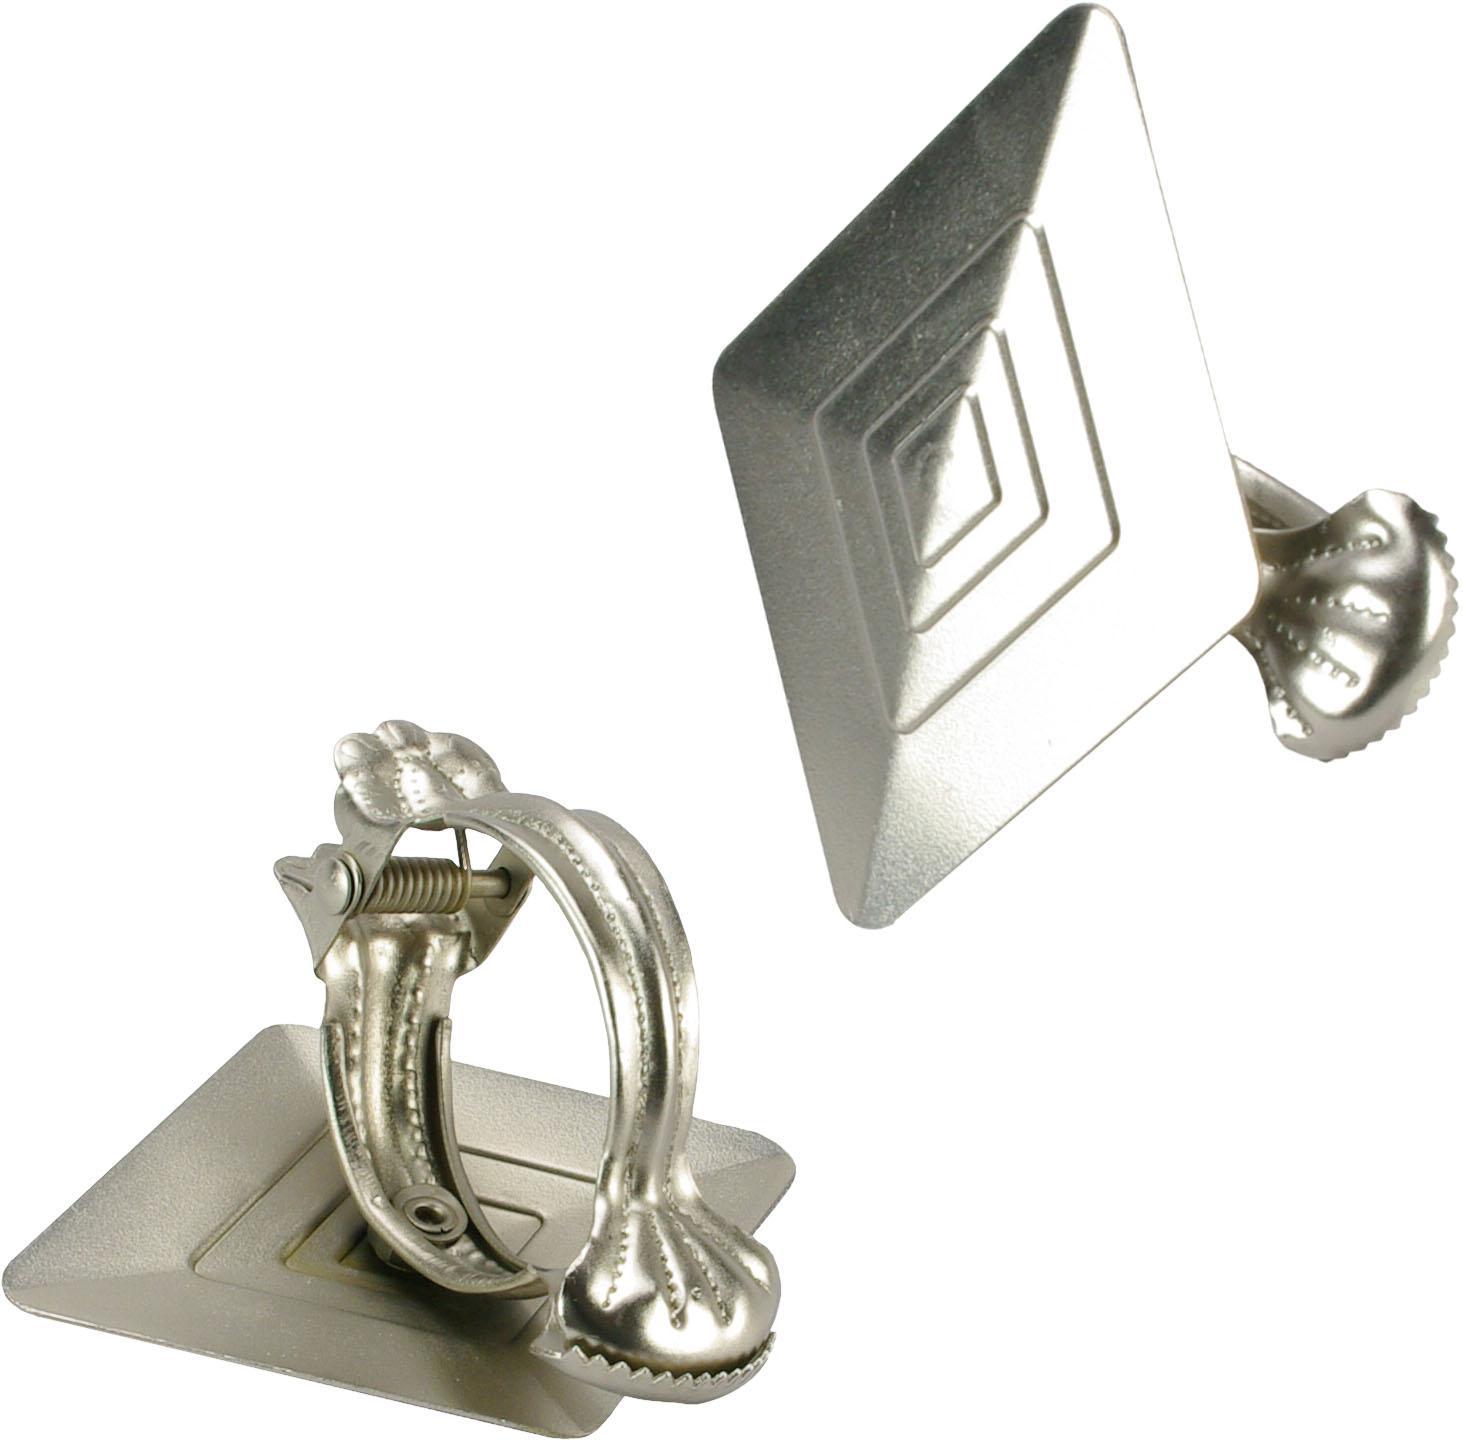 donauklammer liedeco rhombus f r gardinen vorh nge 2 st ck. Black Bedroom Furniture Sets. Home Design Ideas